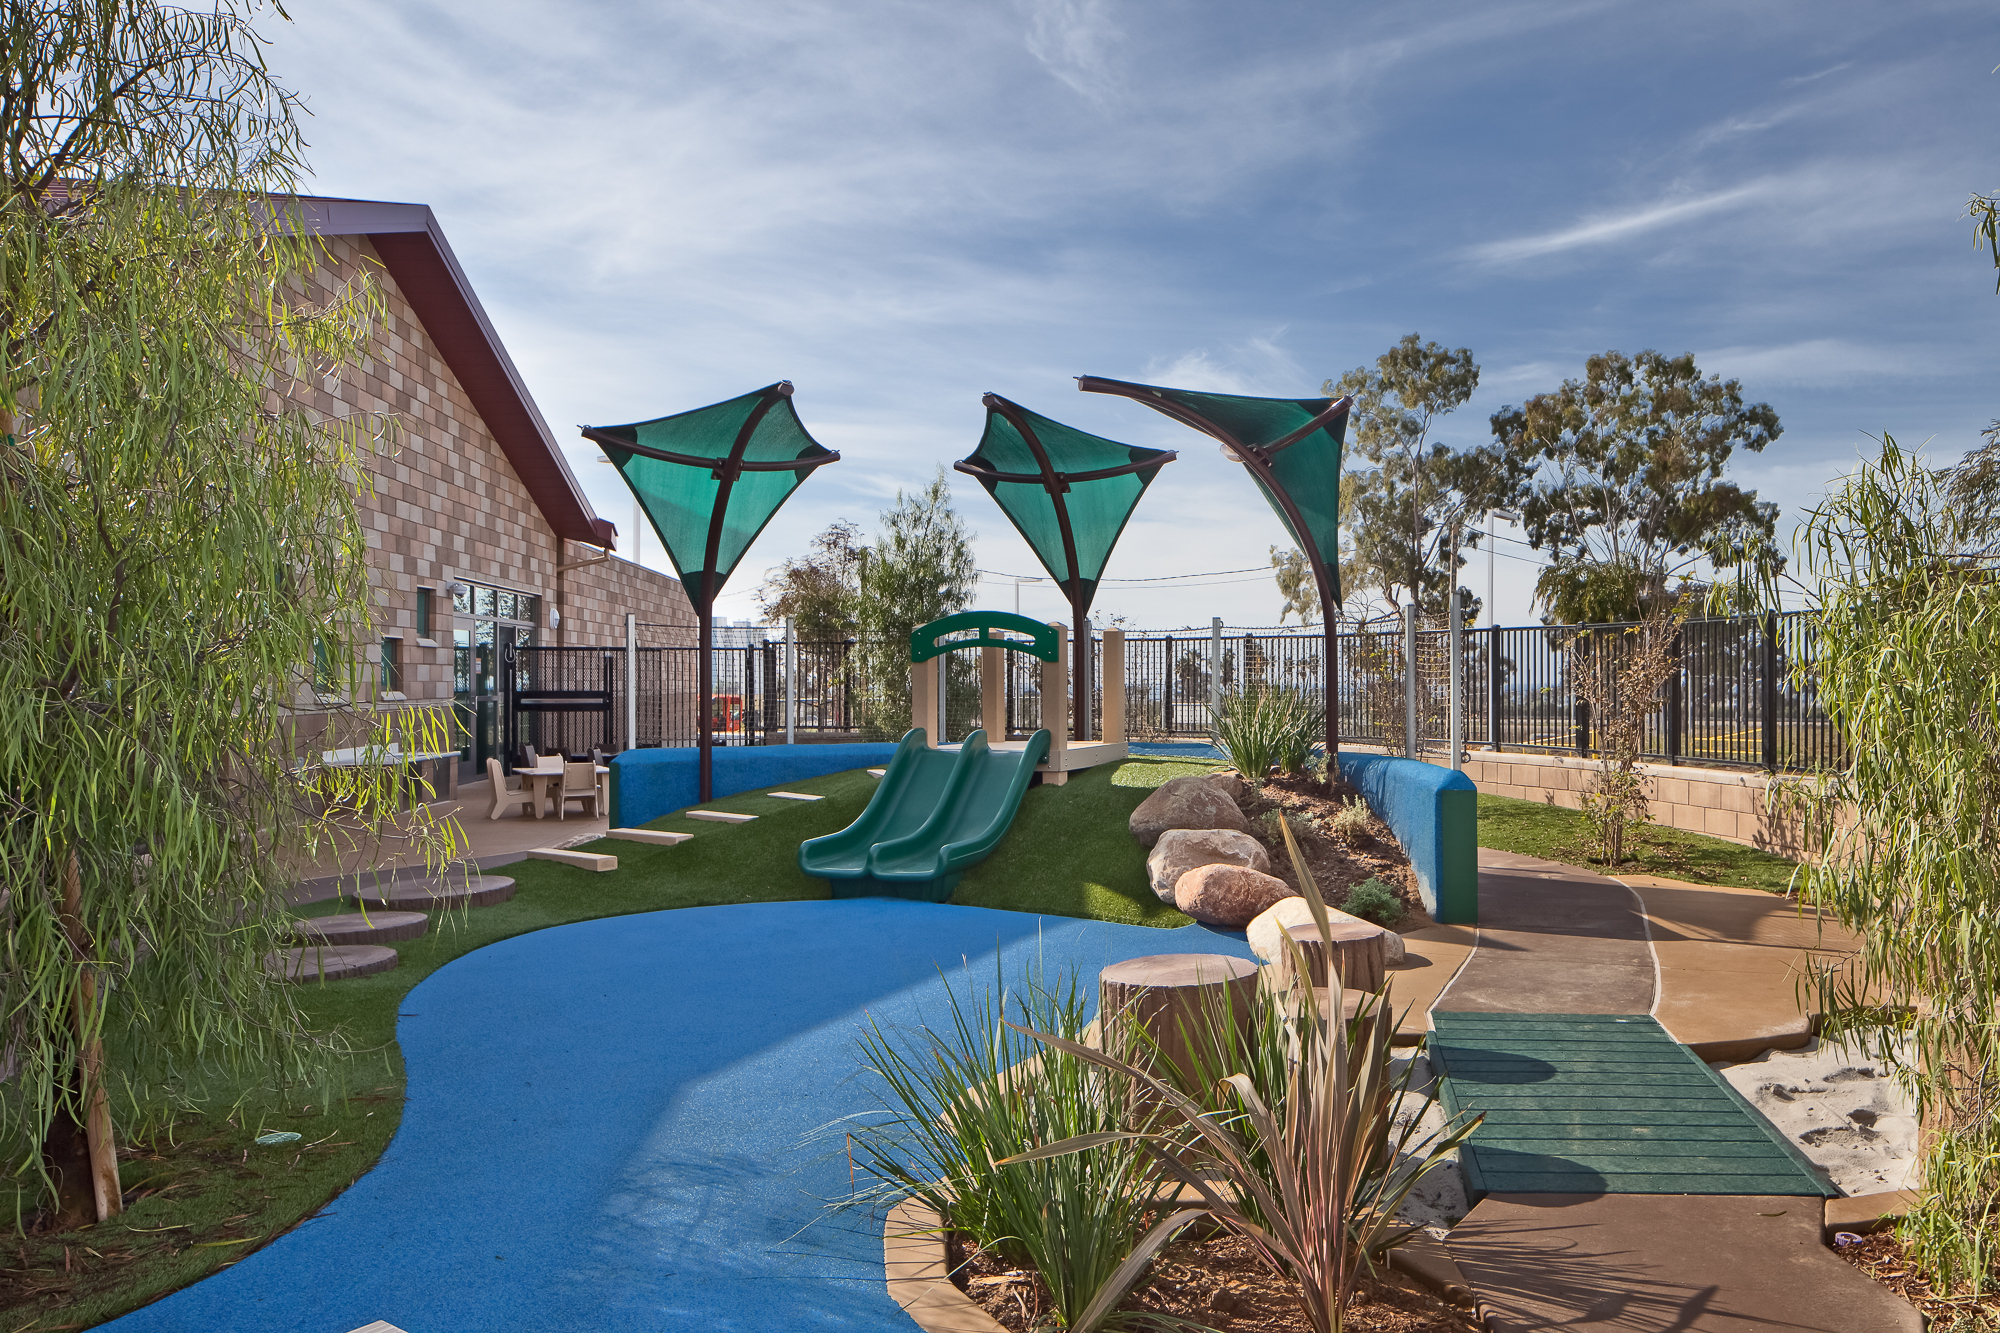 Camp-Pendleton-Child-Development-Center-by-domusstudio-educational-architecture